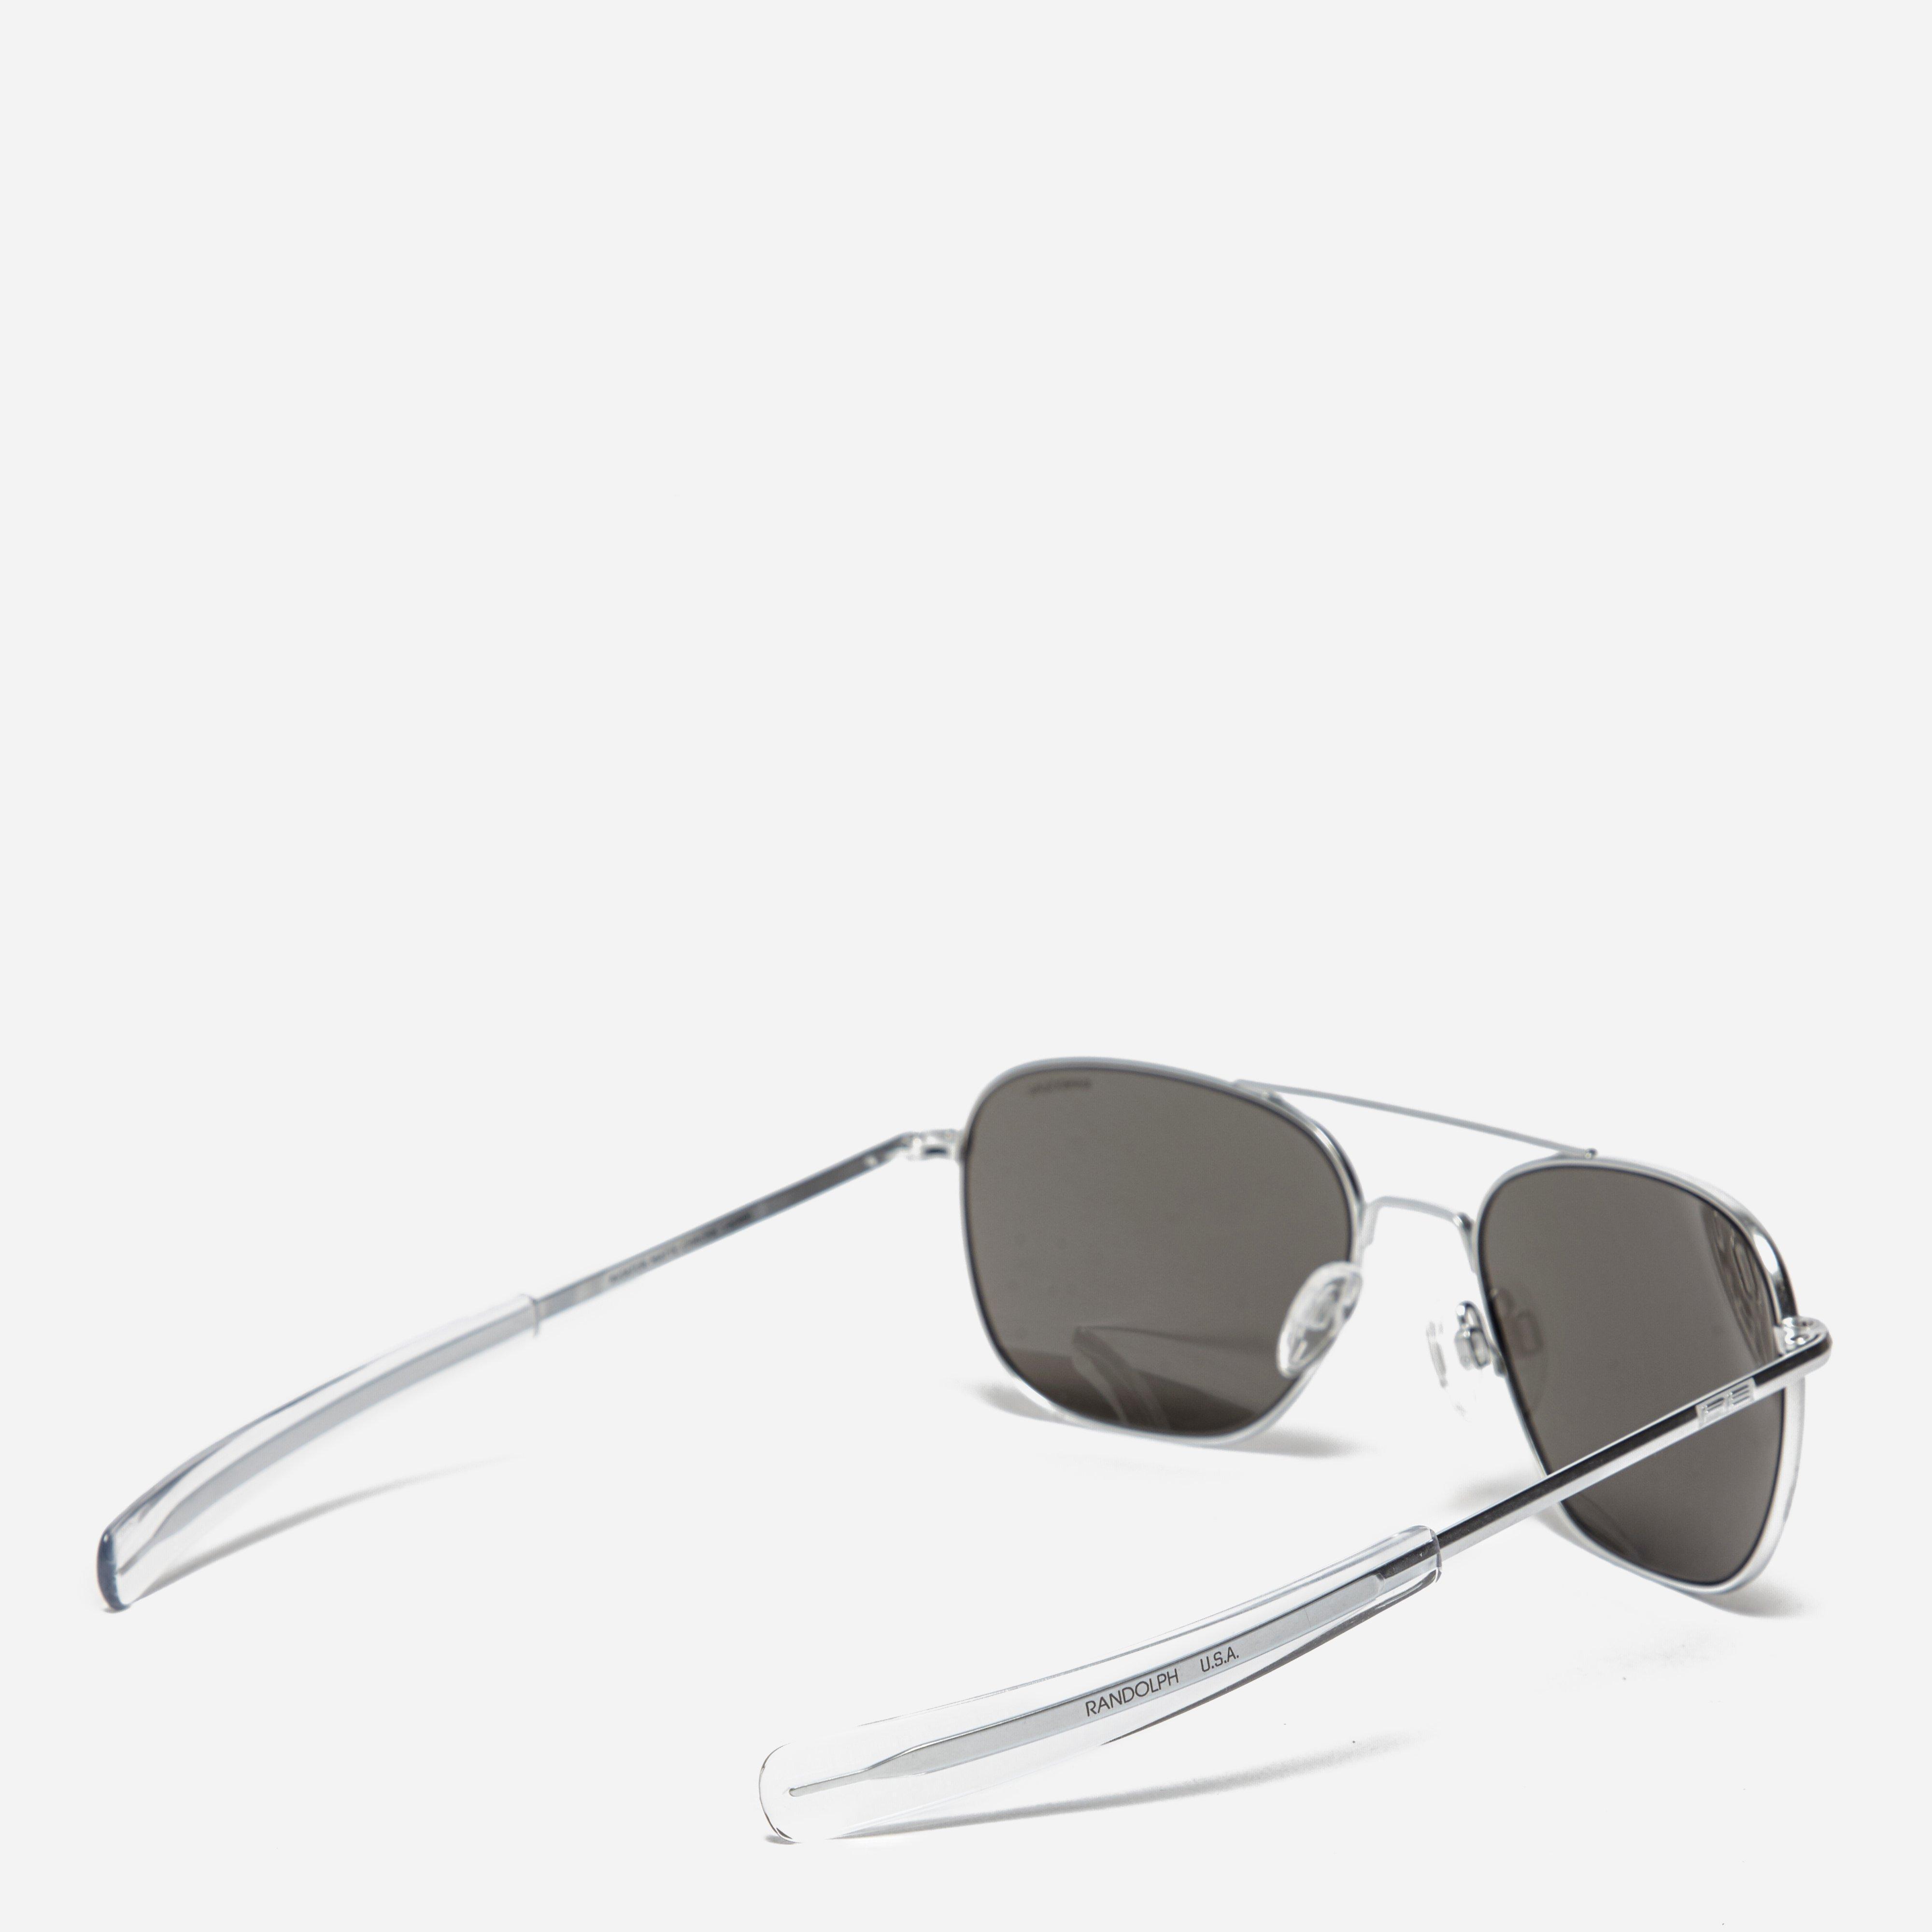 e426229f60d Randolph Aviator Polarized Sungles Chrome Shabooms. Randolph Pbp2468 Pc P3  Shadow 49 23mm Matte Black Skull 140mm Blue Sky Flash